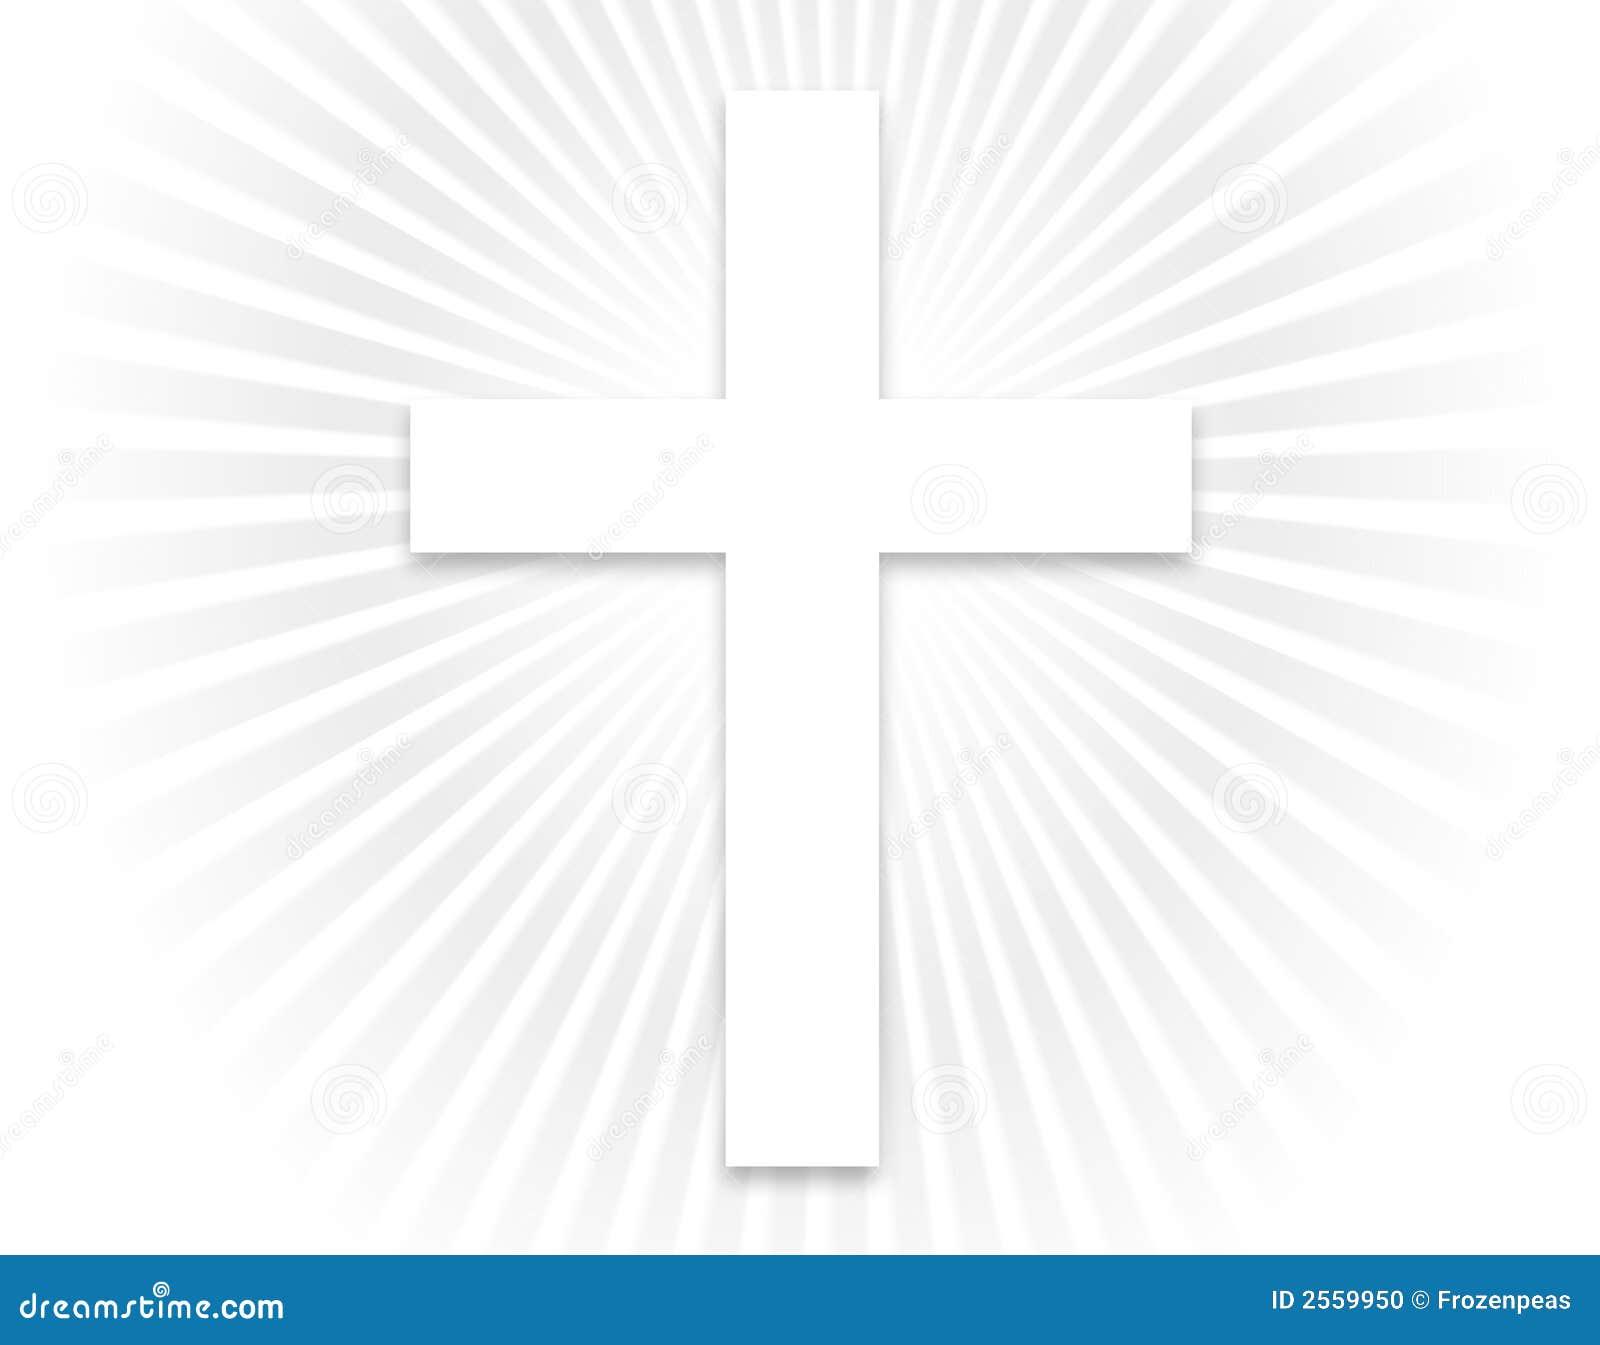 white cross - larger stock photo